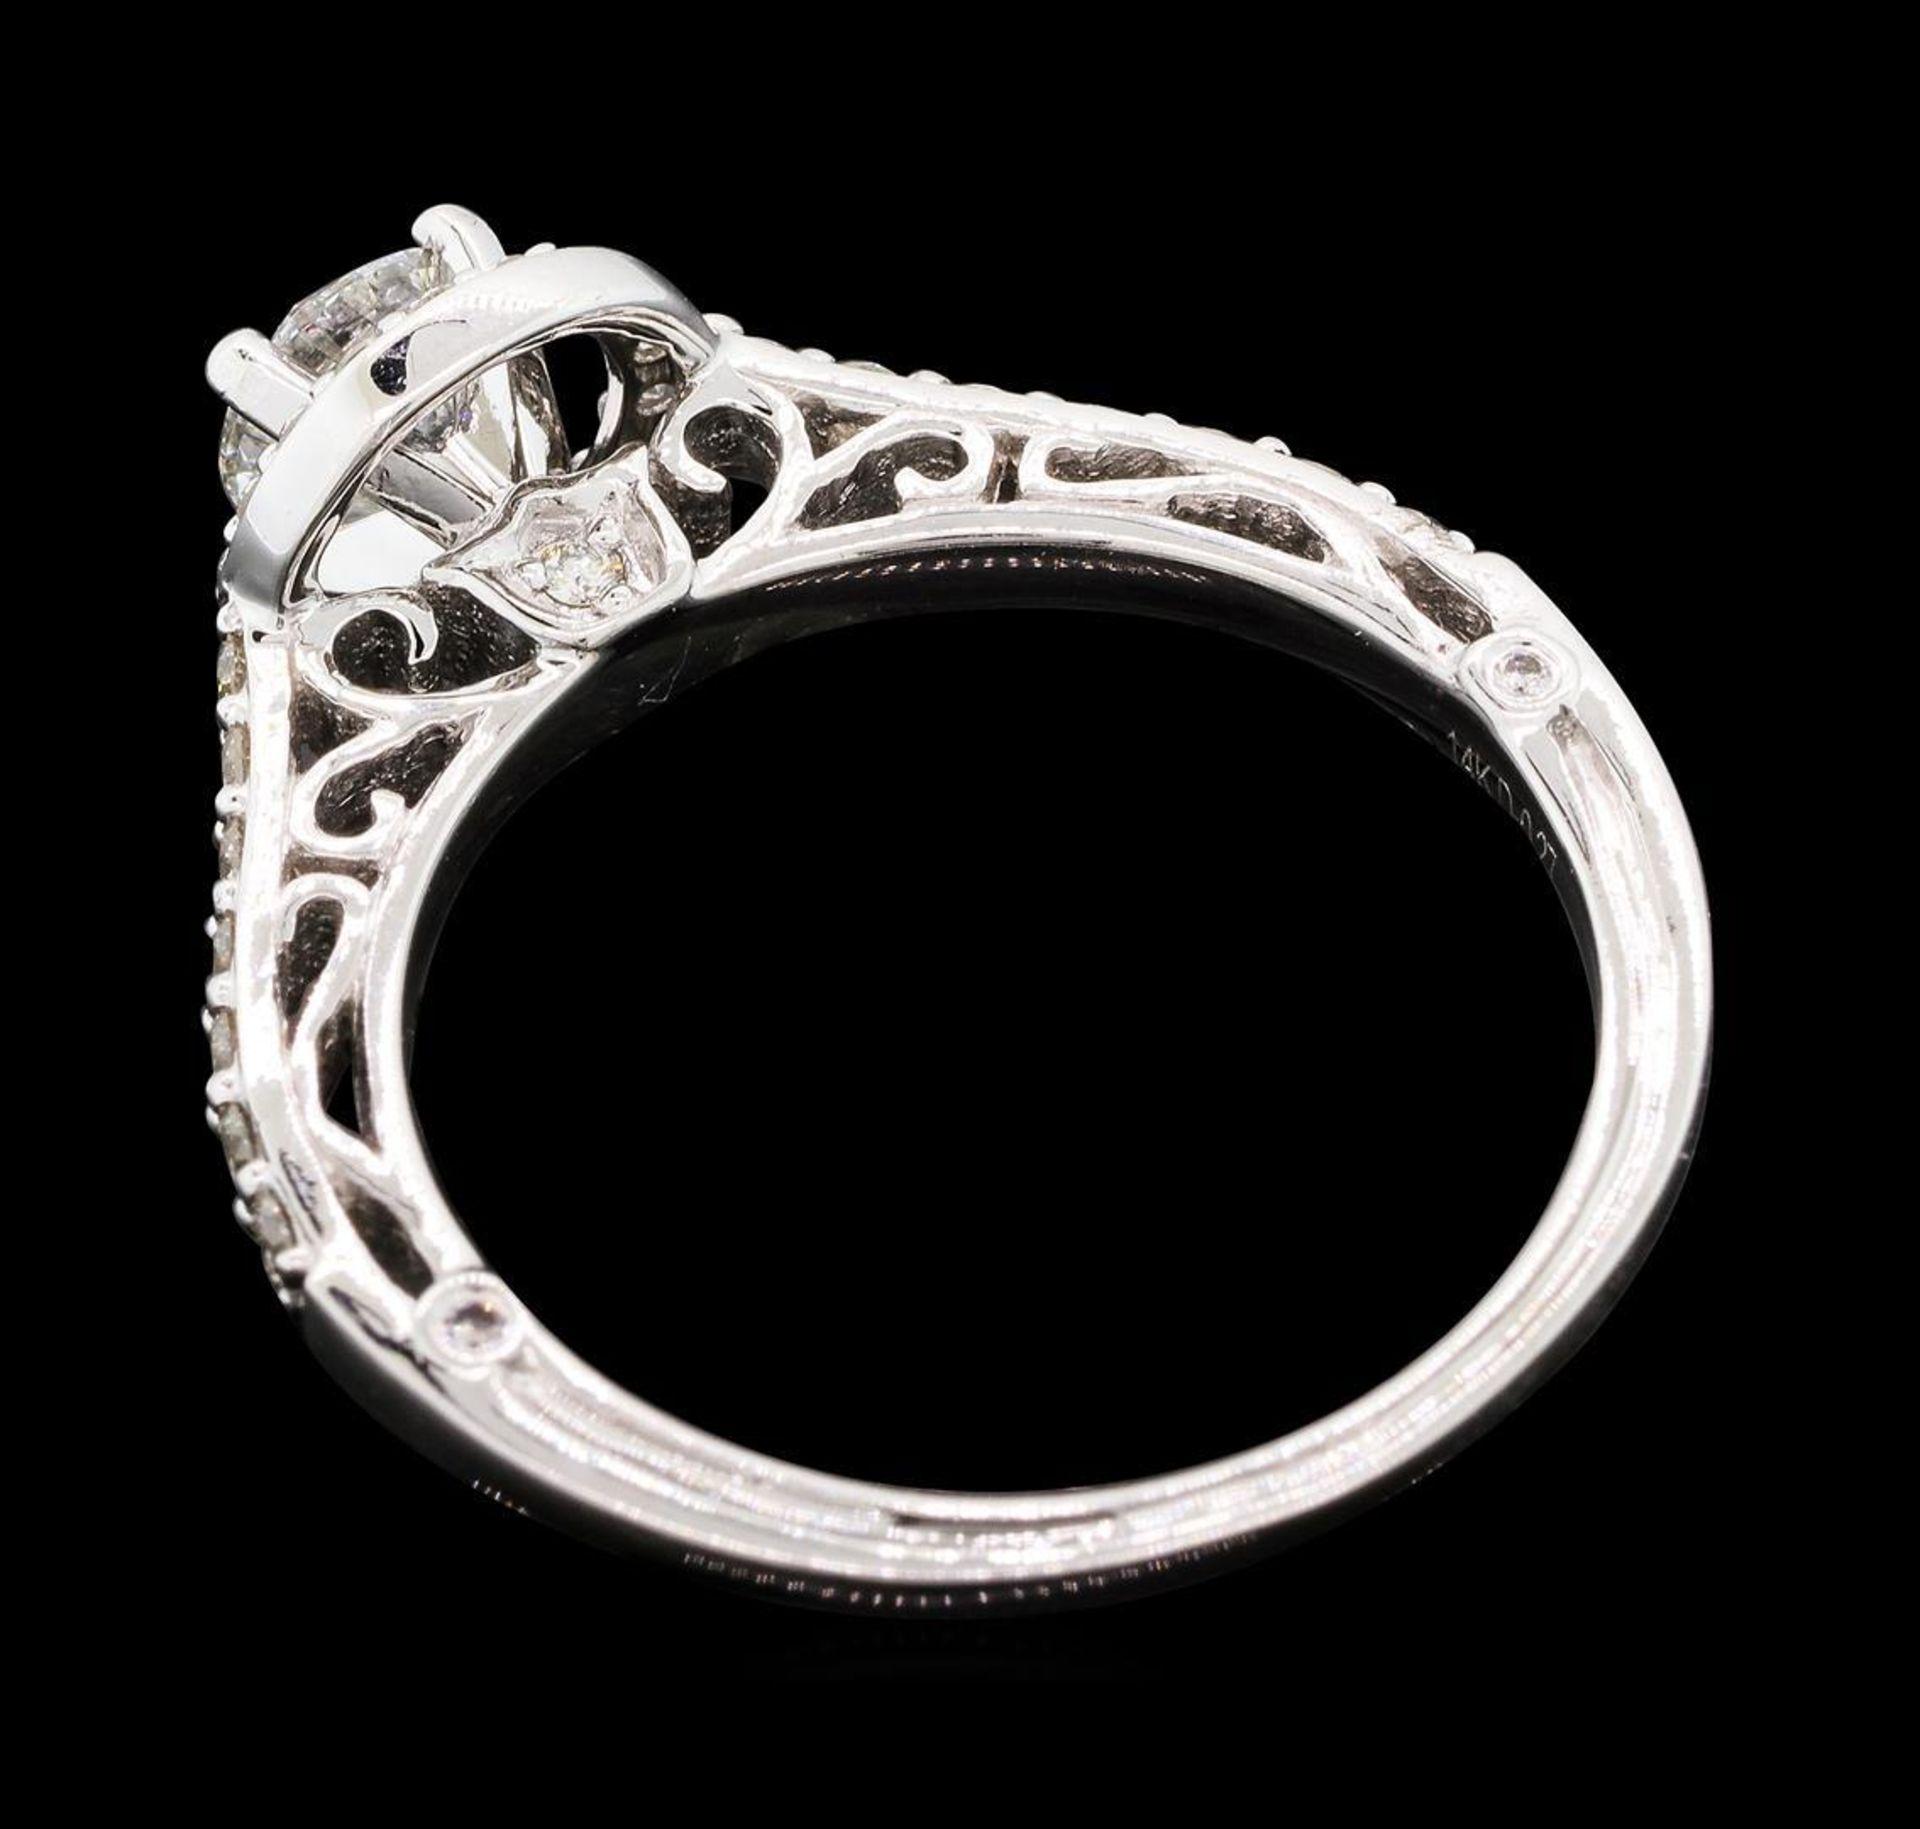 0.79 ctw Diamond Ring - 14KT White Gold - Image 3 of 5